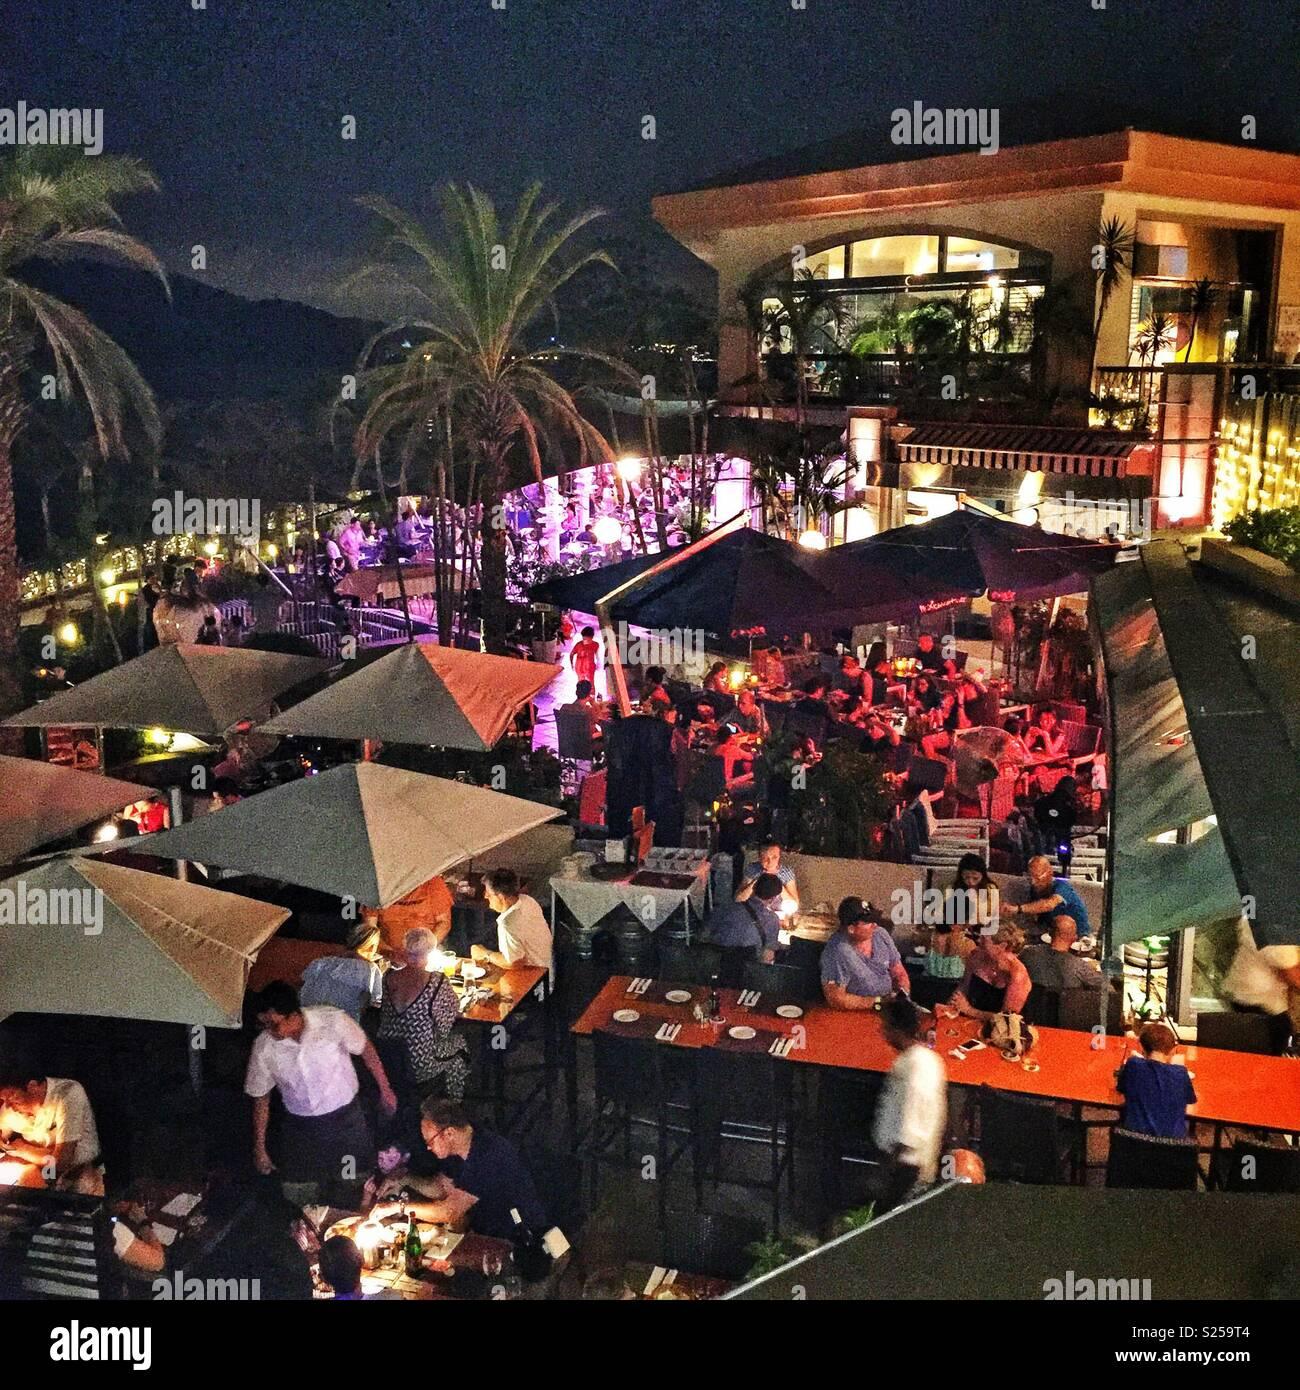 Alfresco restaurant dining in Discovery Bay, Lantau Island, Hong Kong - Stock Image